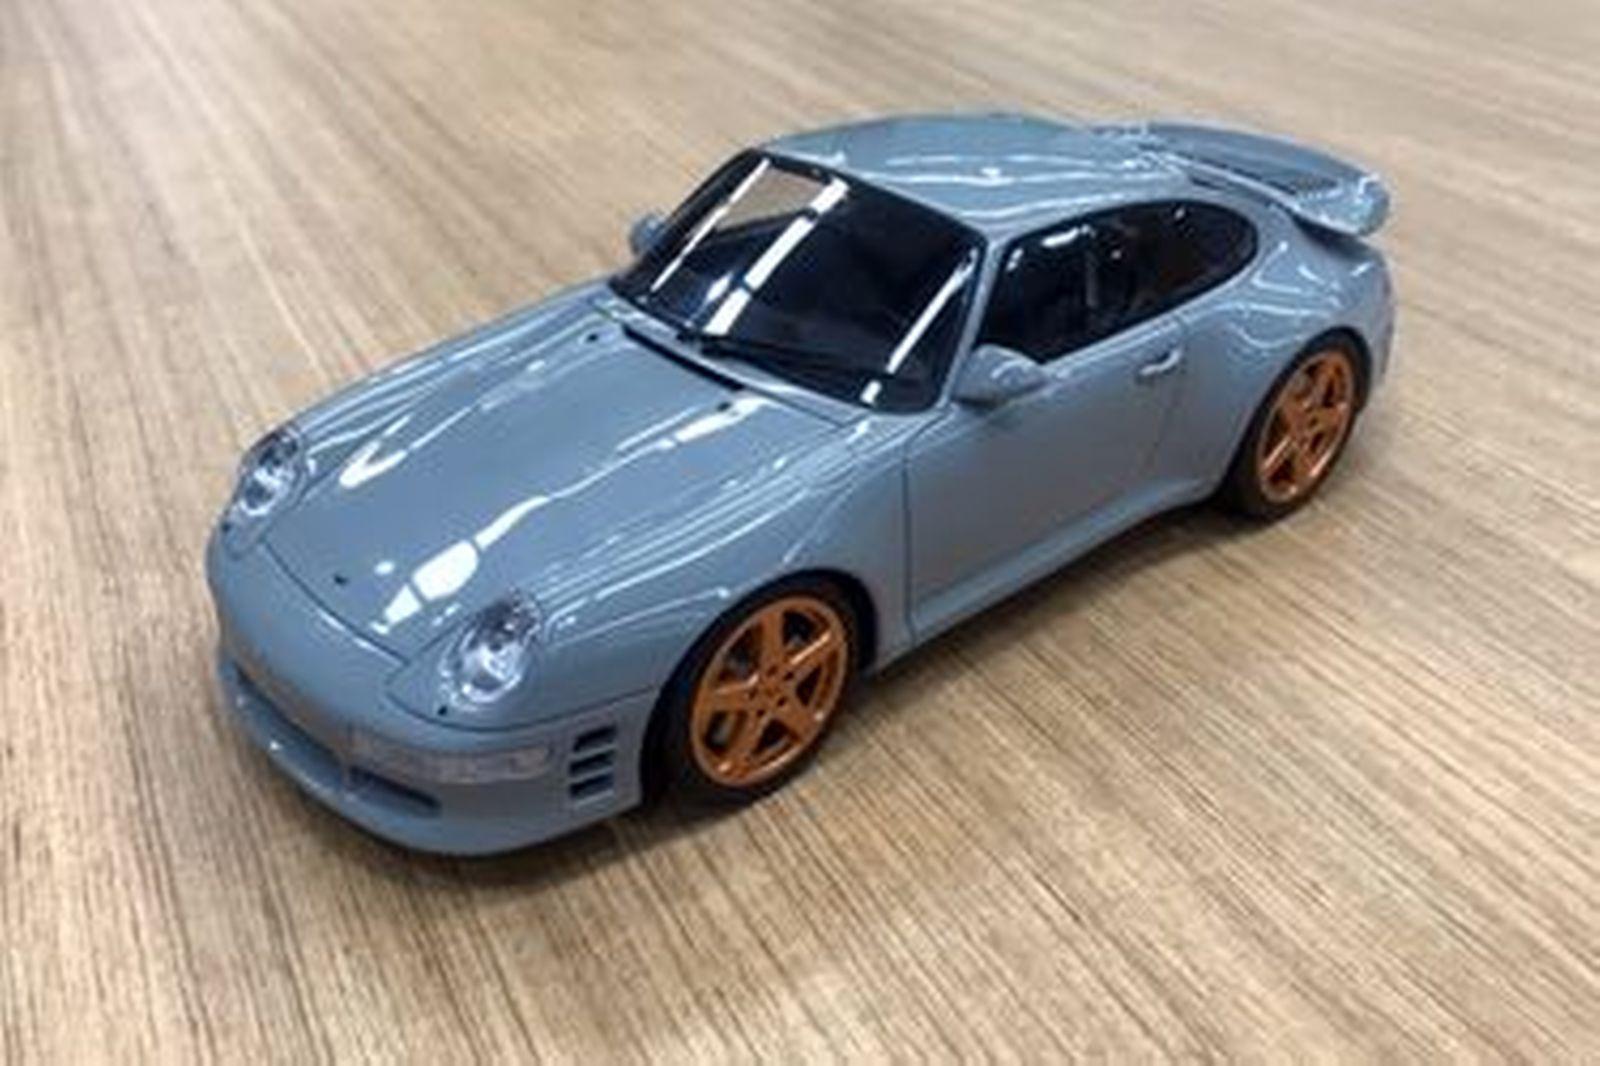 Model Car - Porsche GT145 RUF Turbo Limited Grey - GT Spirit  (Scale -1:18)